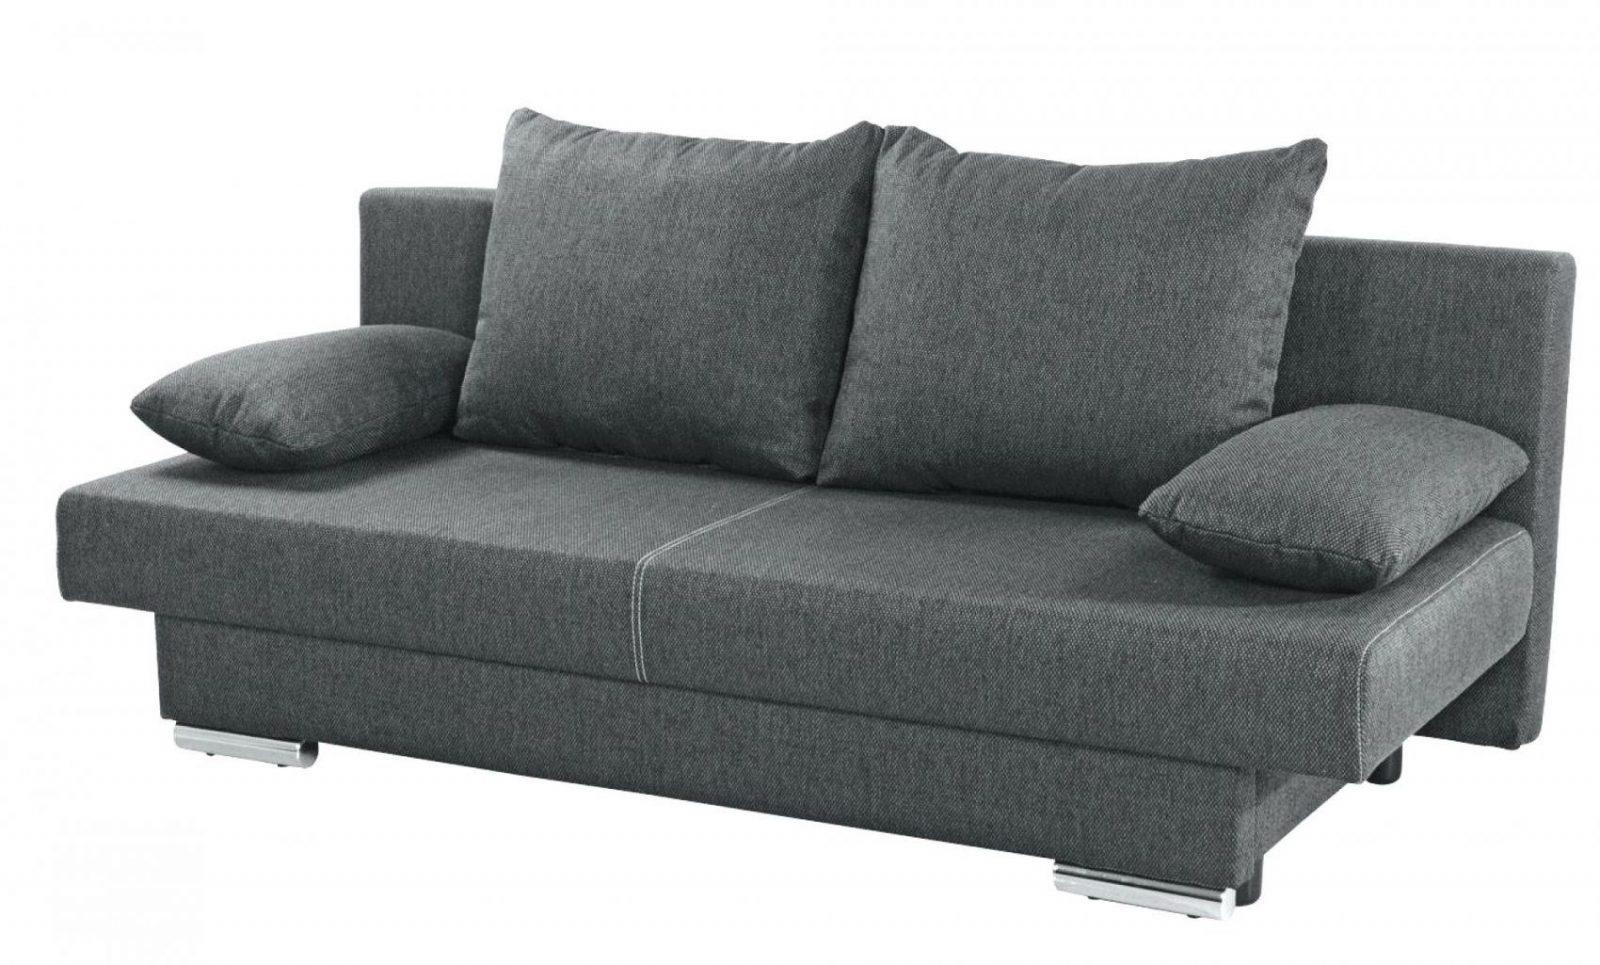 New Couch Poco  Homemaison von 2 Sitzer Sofa Poco Bild